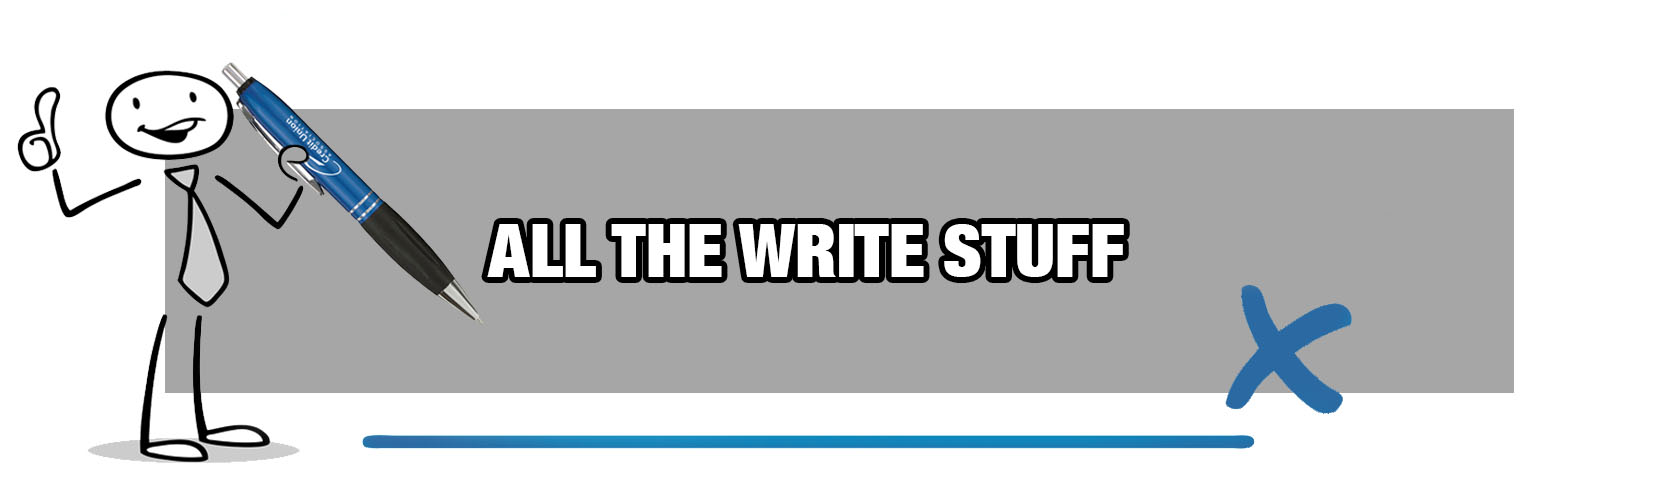 All The Write Stuff